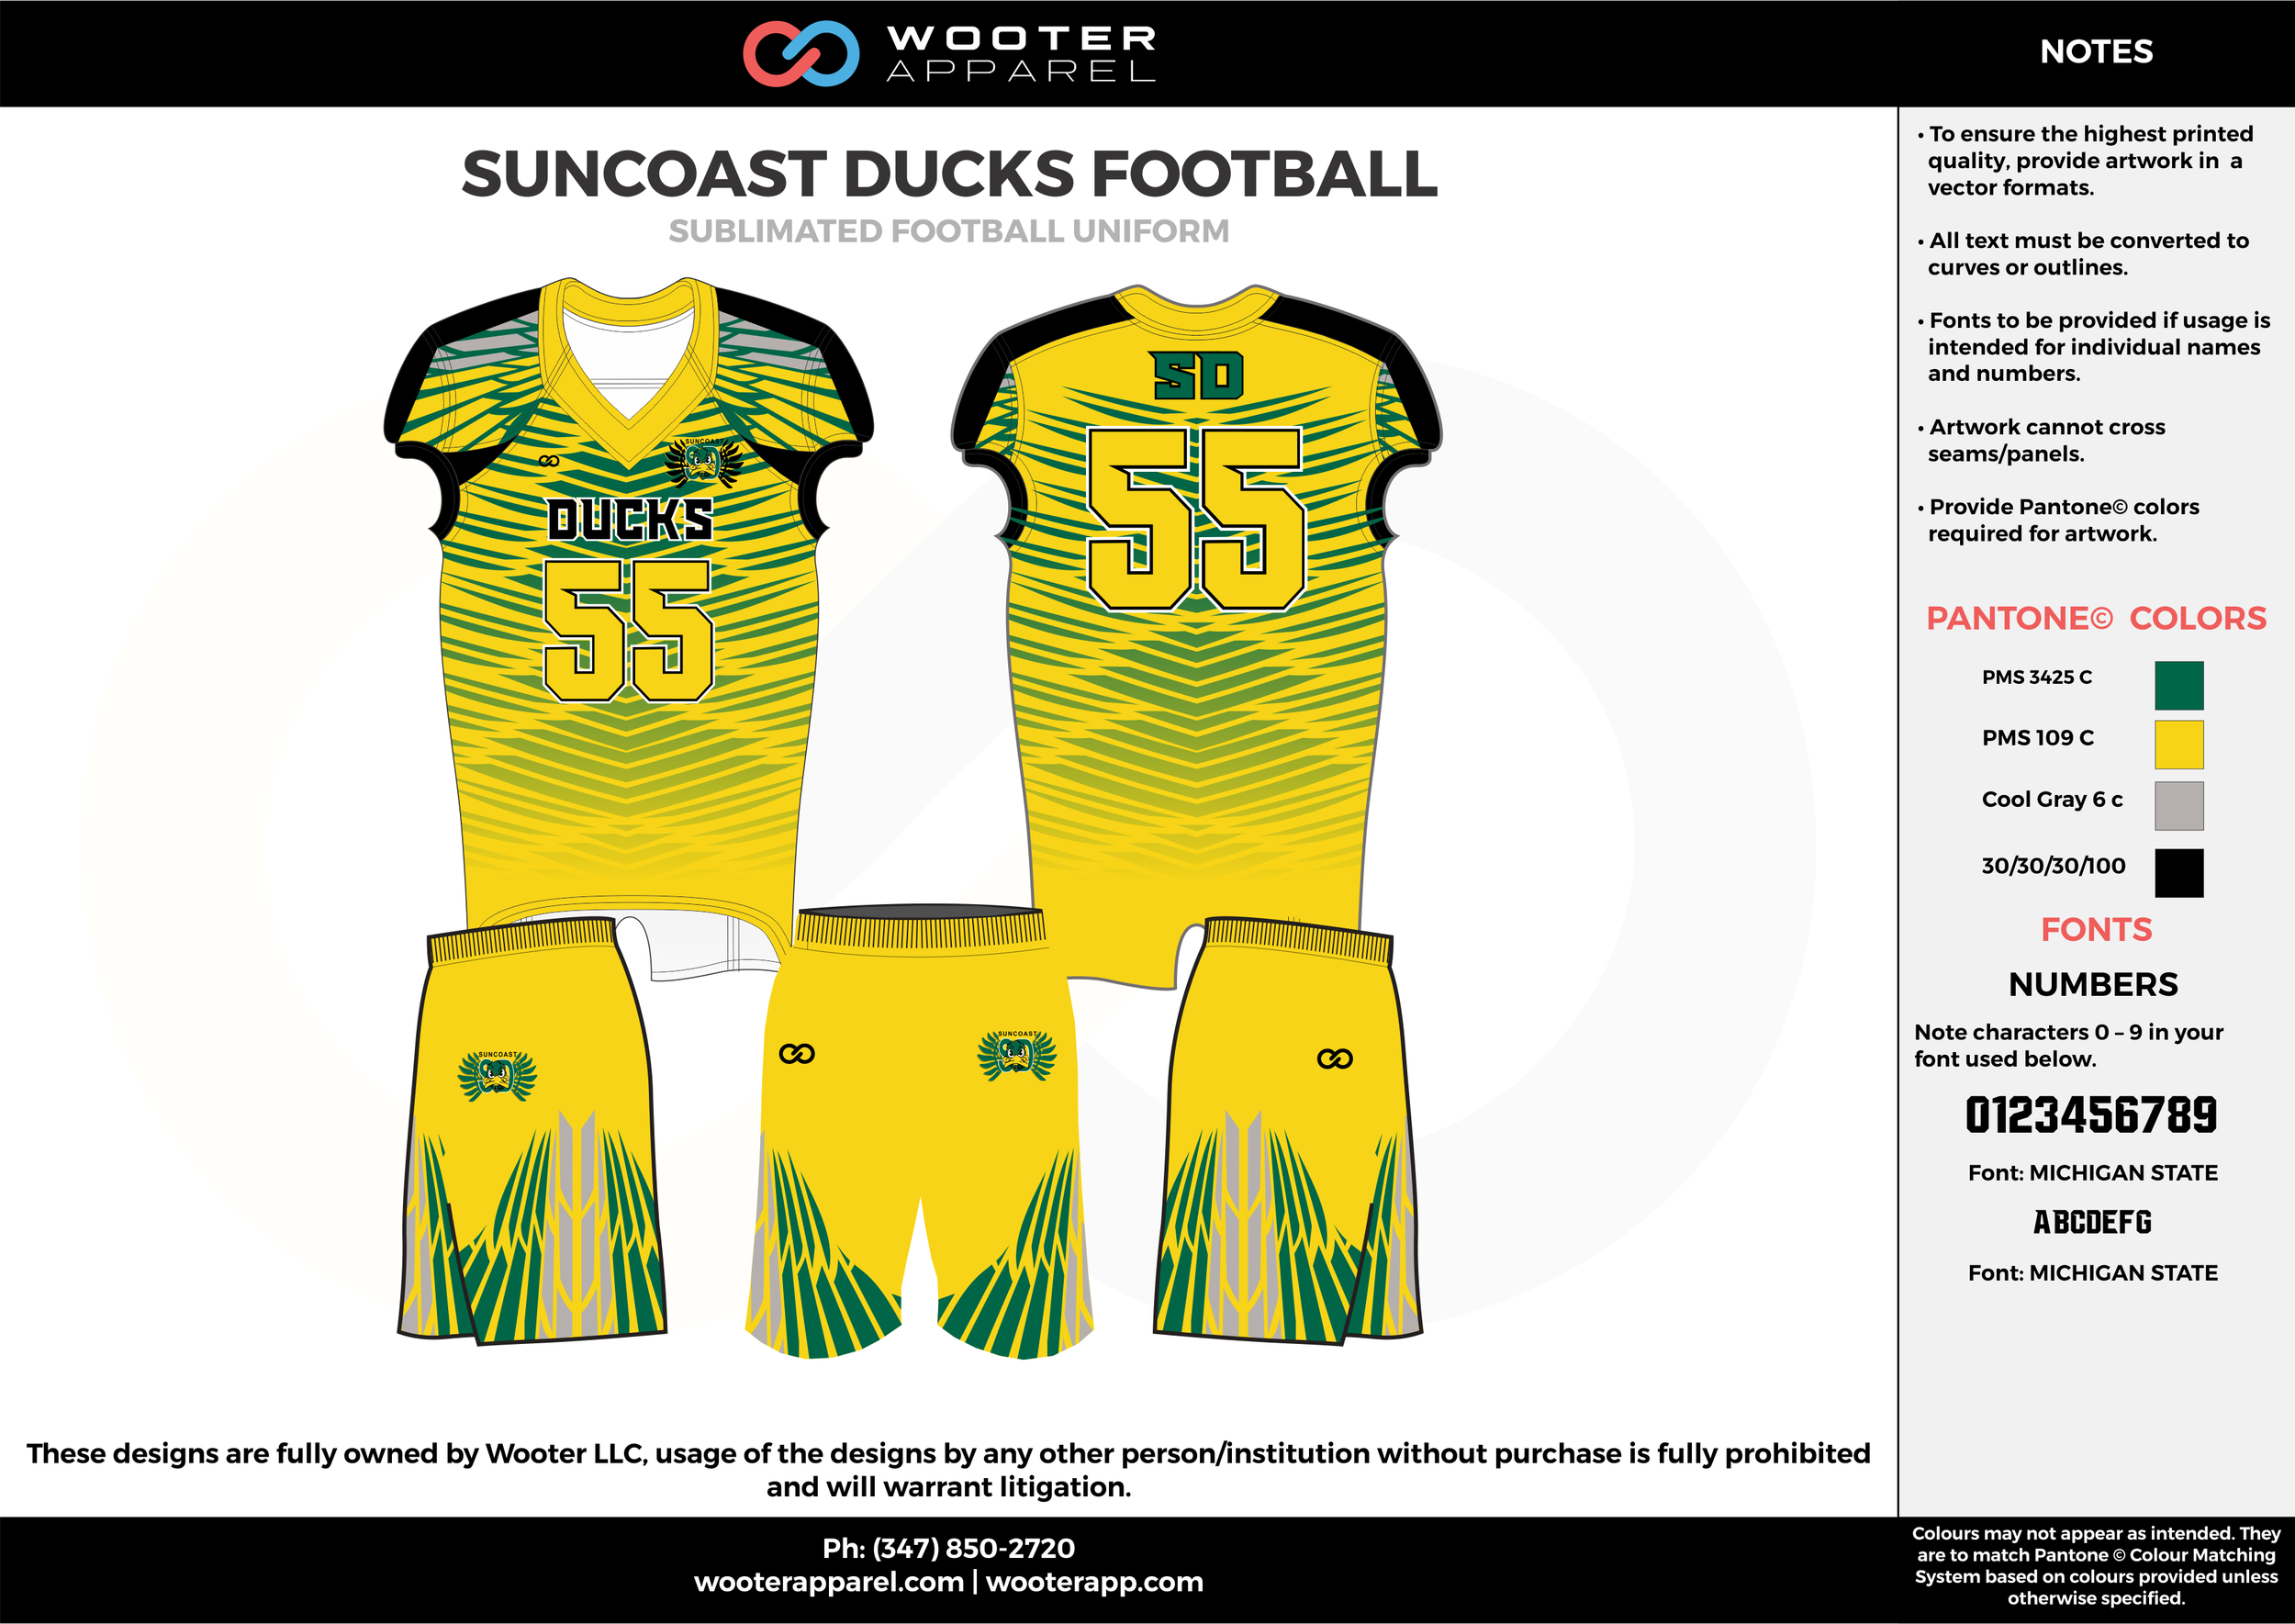 SUNCOAST DUCKS FOOTBALL yellow green gray black football uniforms jerseys shorts